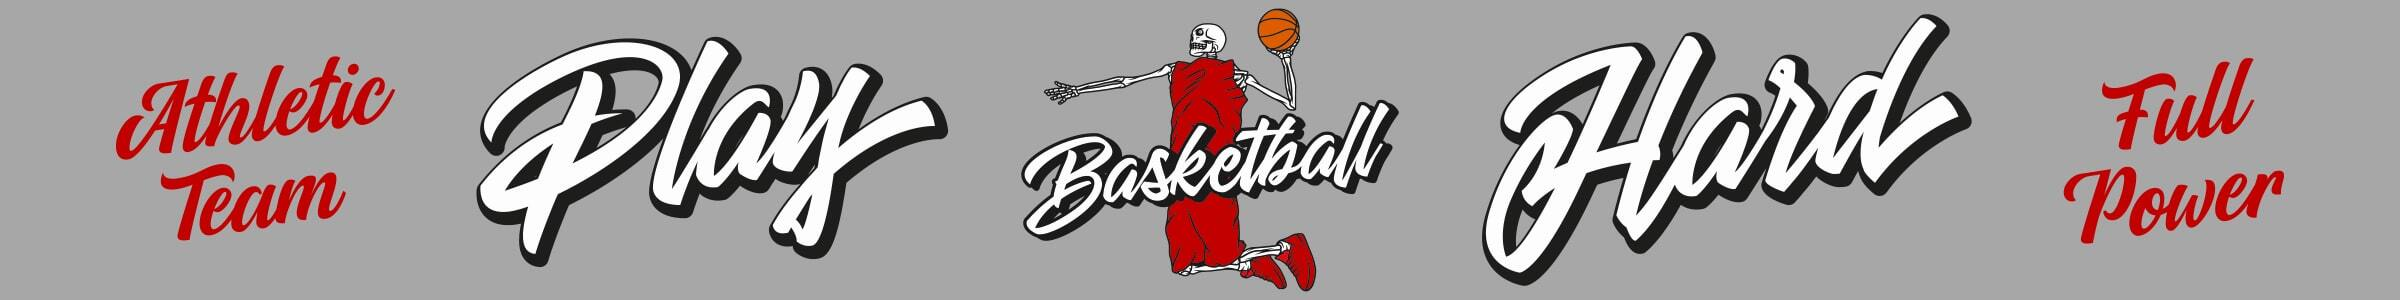 Category_Teaser_Header_Basketball_2400x300